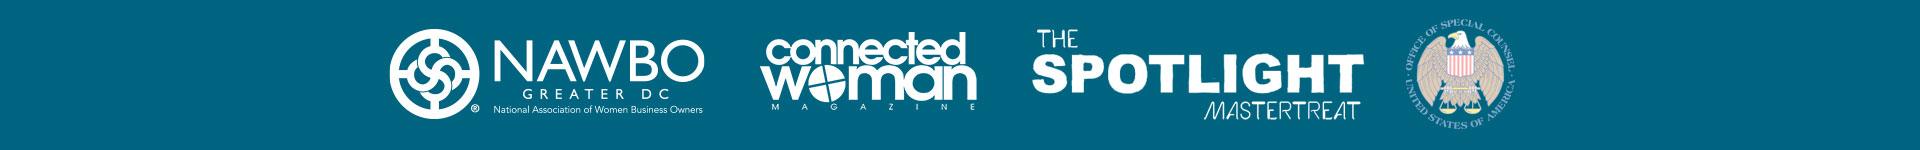 press-logos-banner